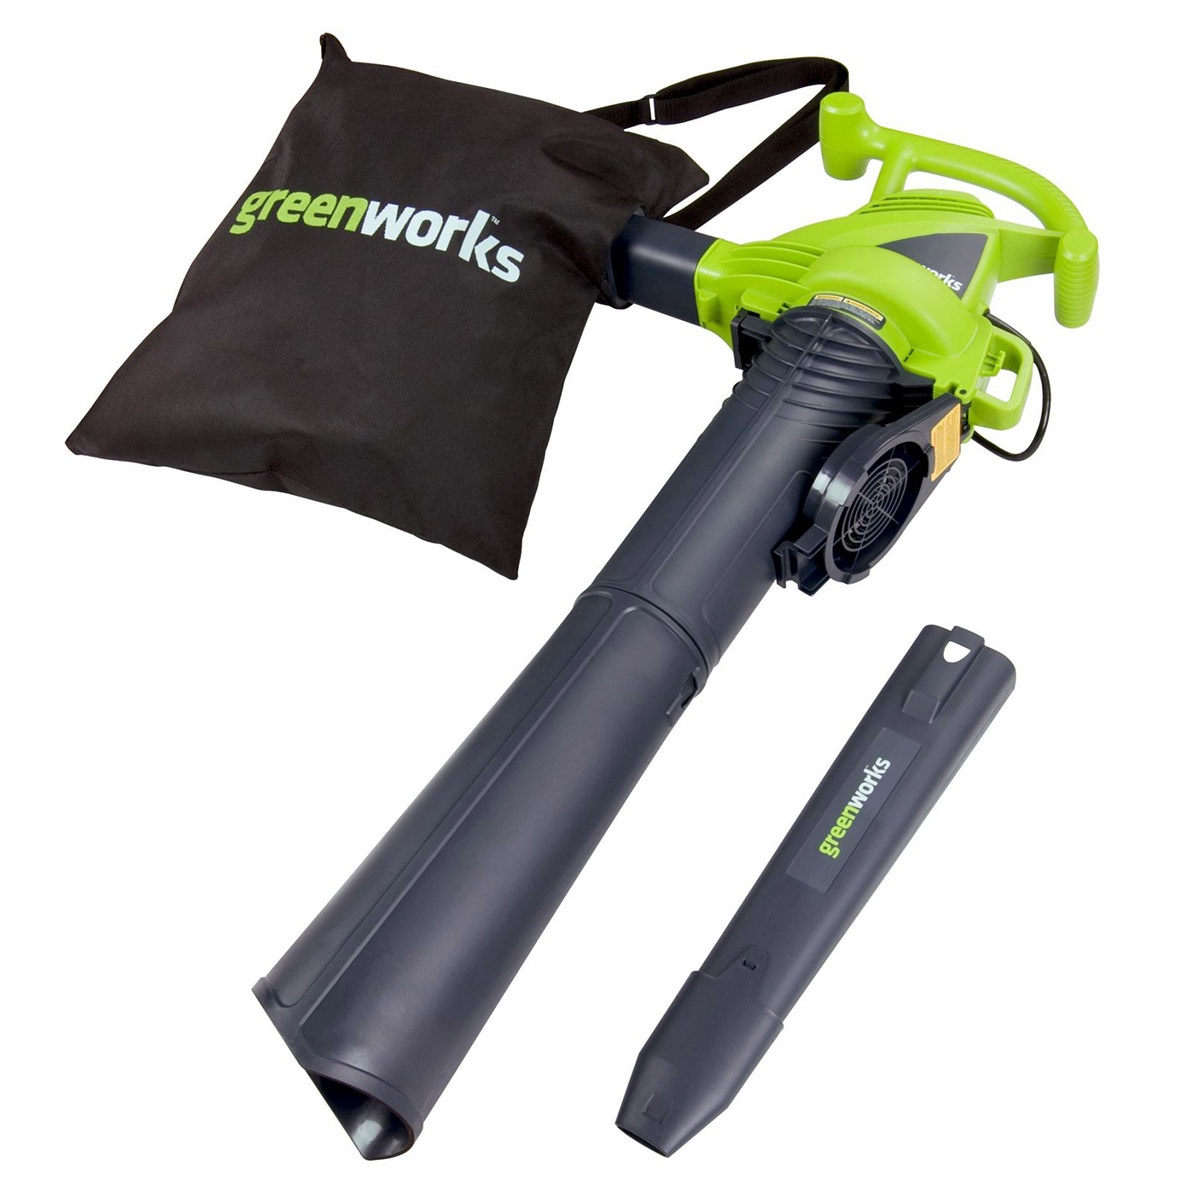 цена на Воздуходувка Greenworks GBV2800